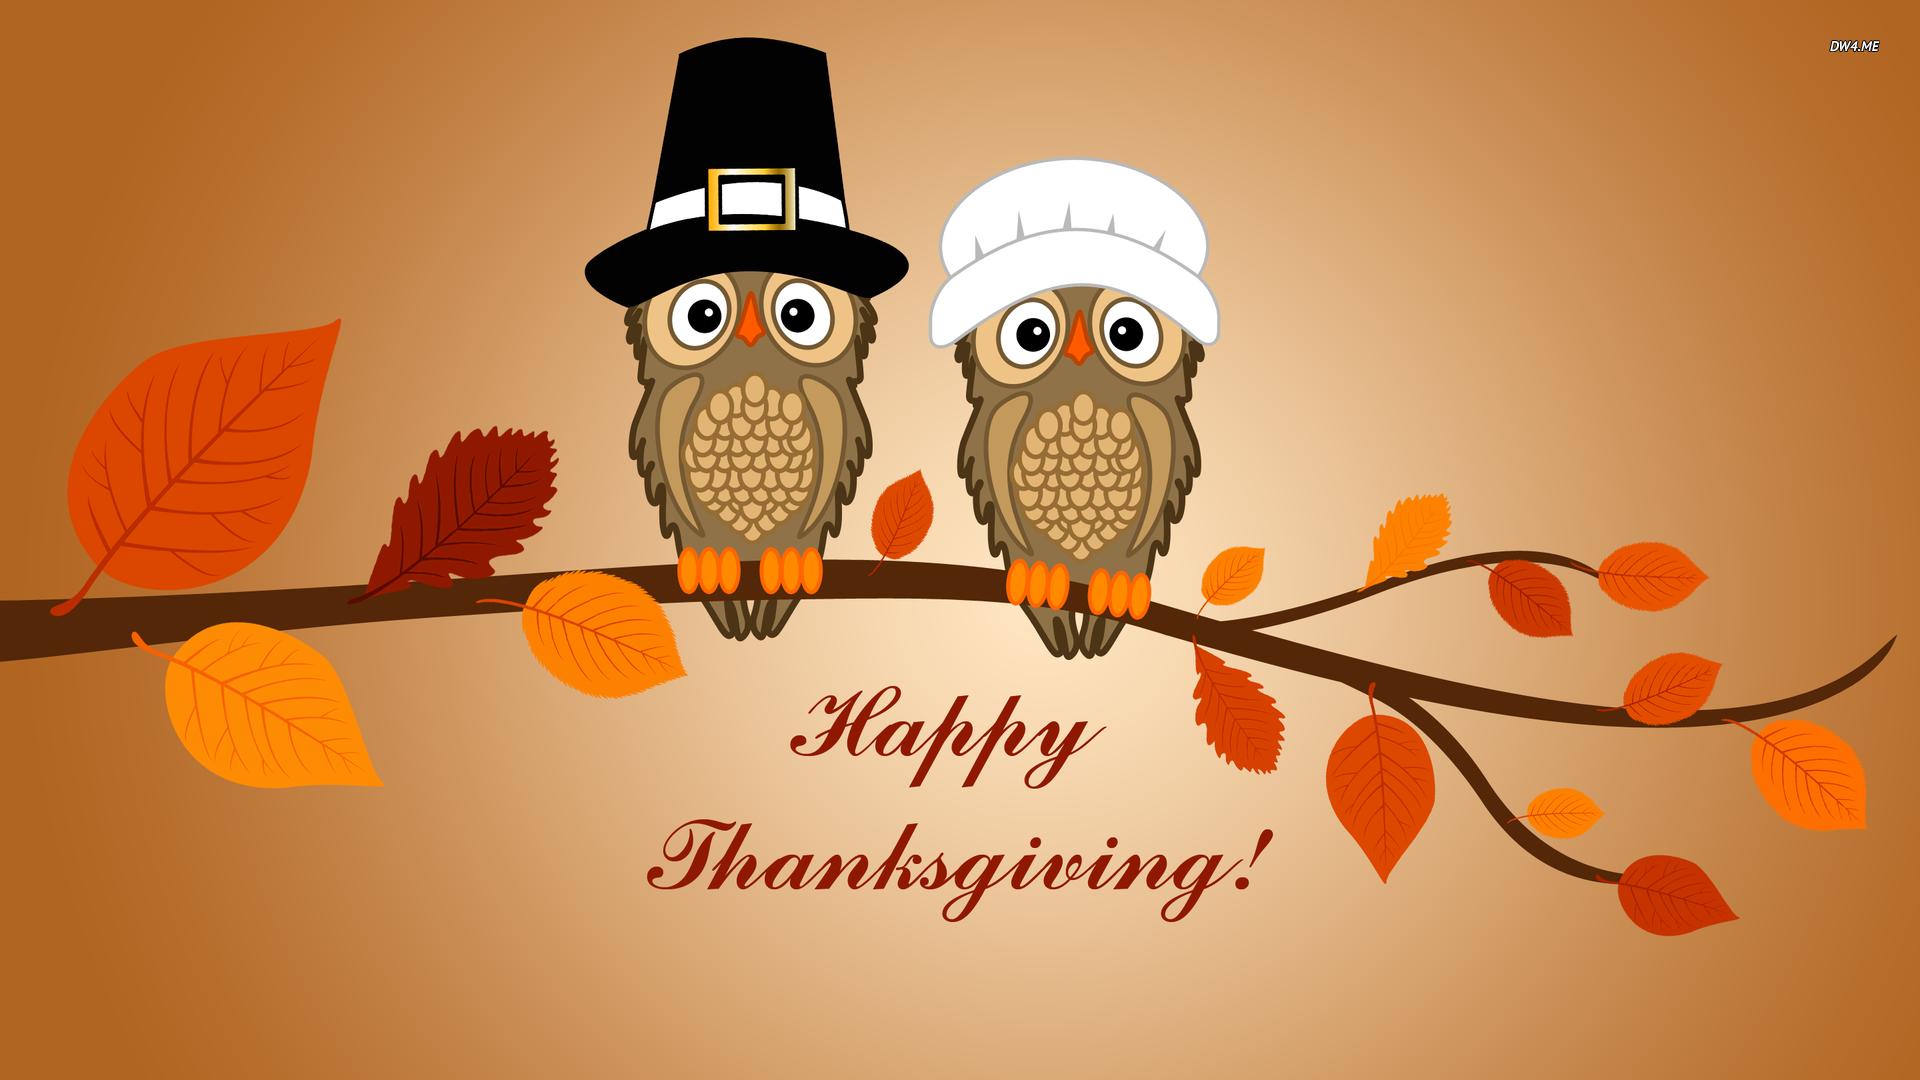 Thanksgiving Wallpaper Backgrounds HD Full Width 1920x1080